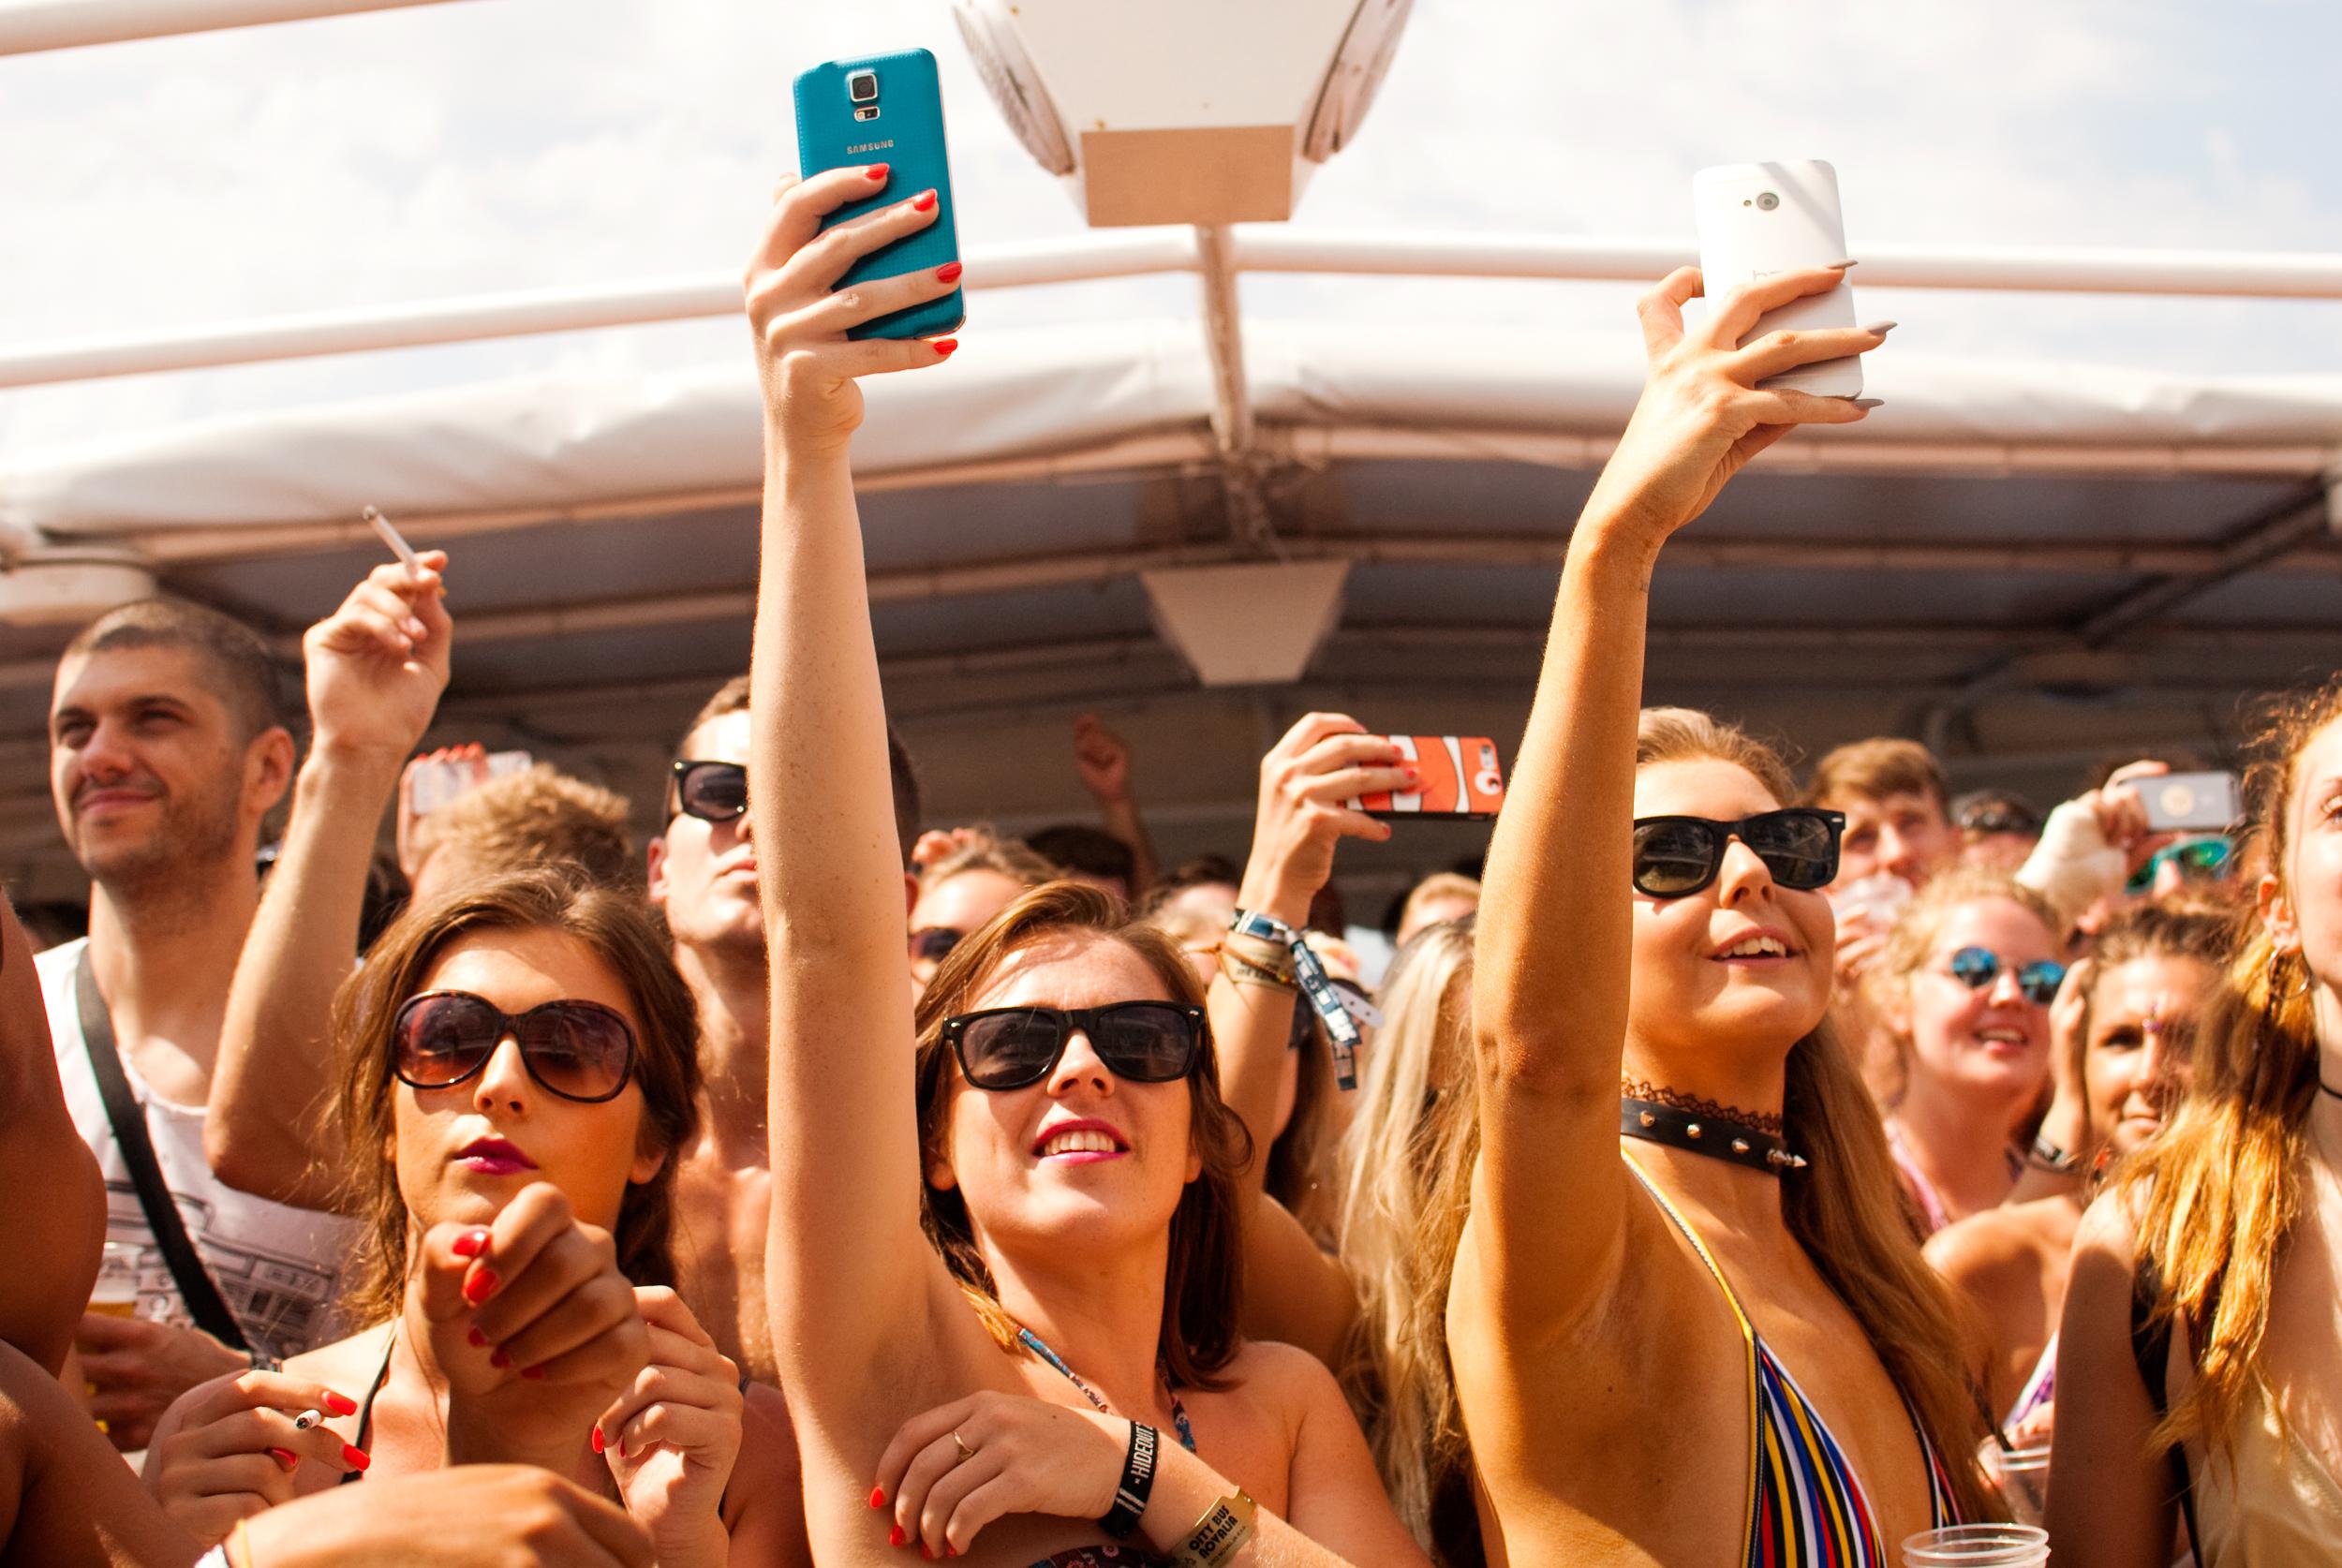 GeorginaCook_hideout_festival_croatia_boat_party_girls_phone.jpg